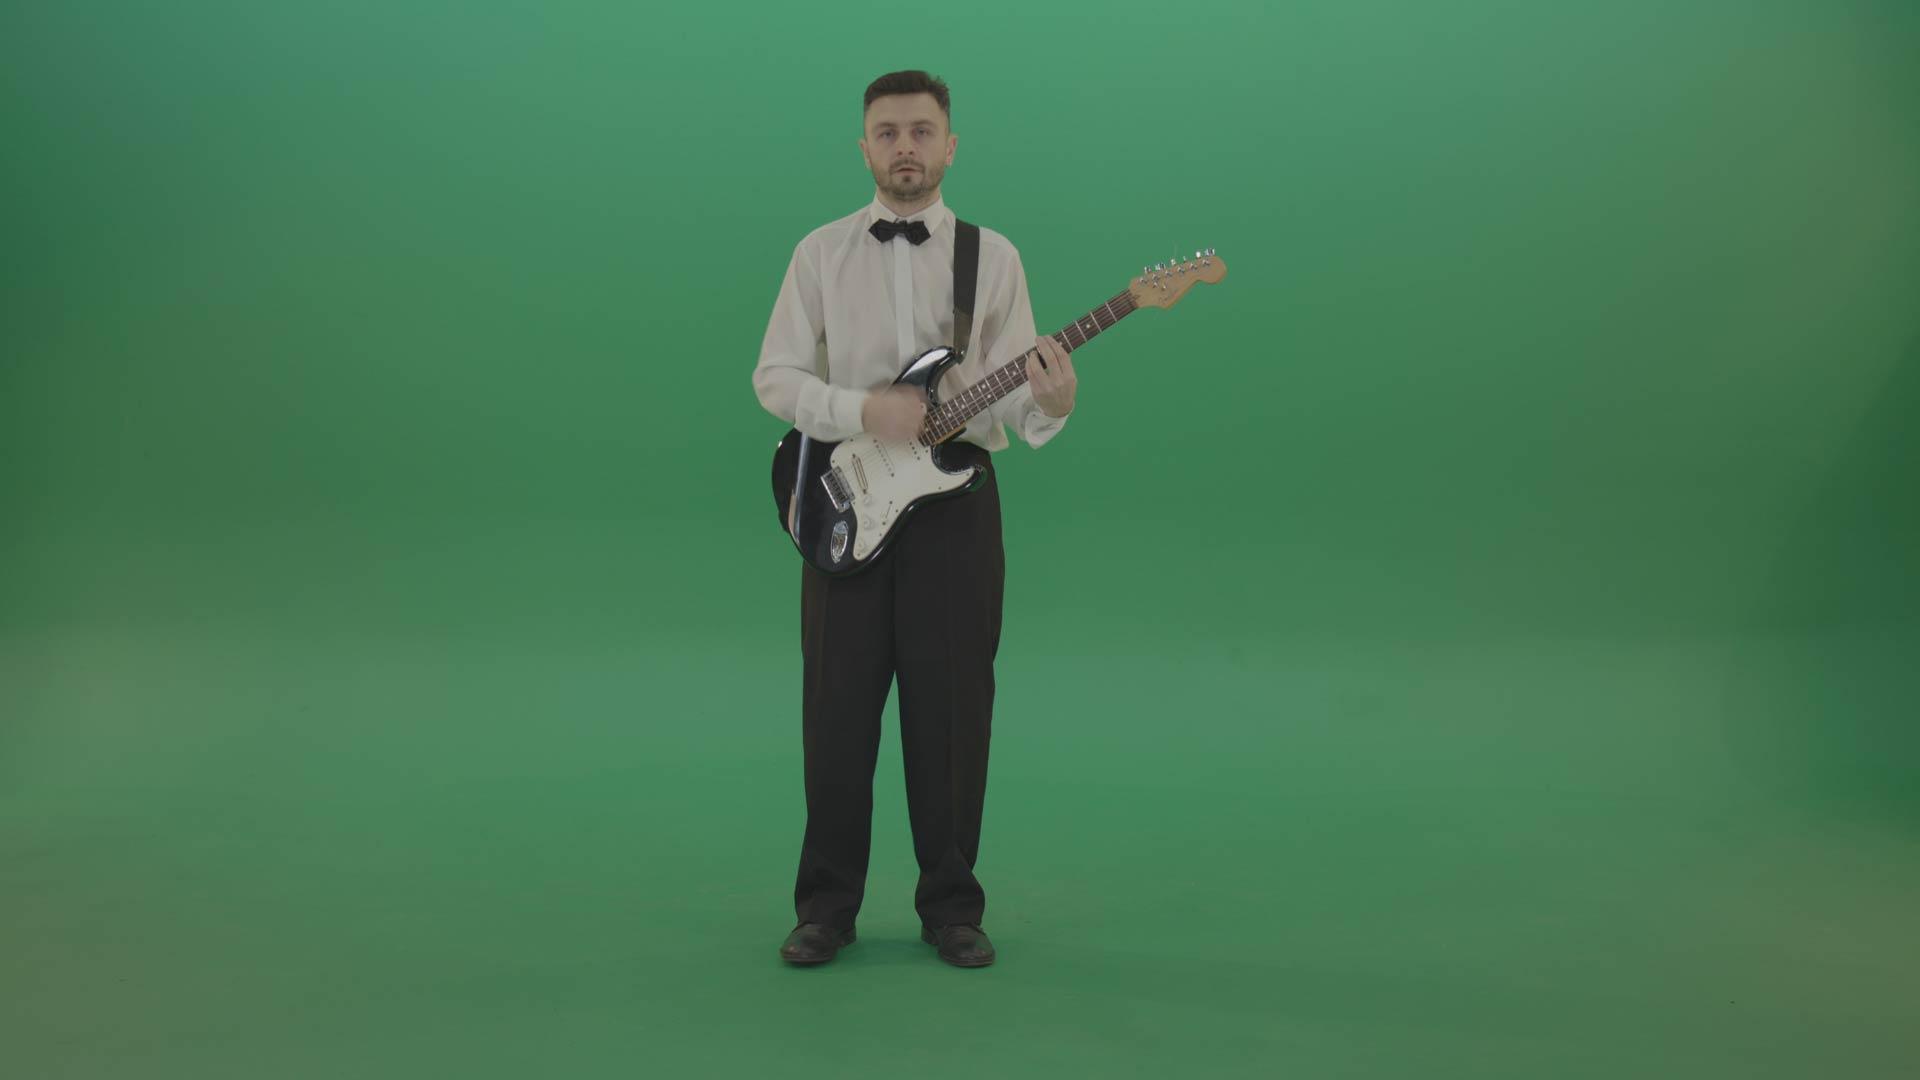 music-artists-green-screen-video-footage